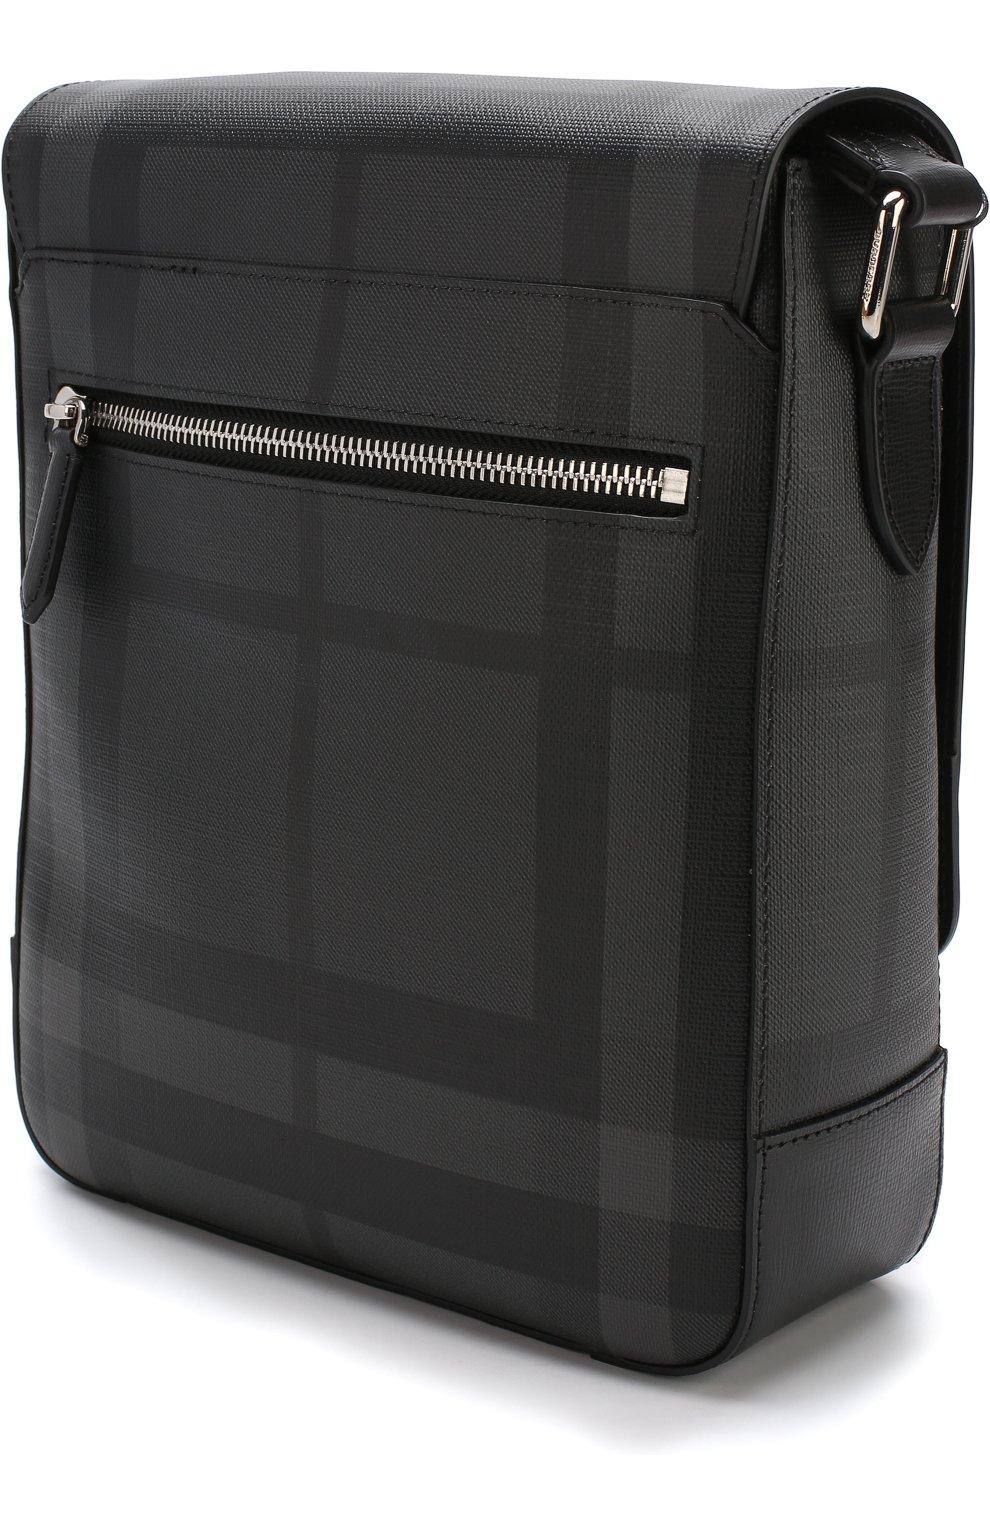 2bf2a2aa2947 Мужская темно-серого сумка-планшет в клетку london check BURBERRY ...